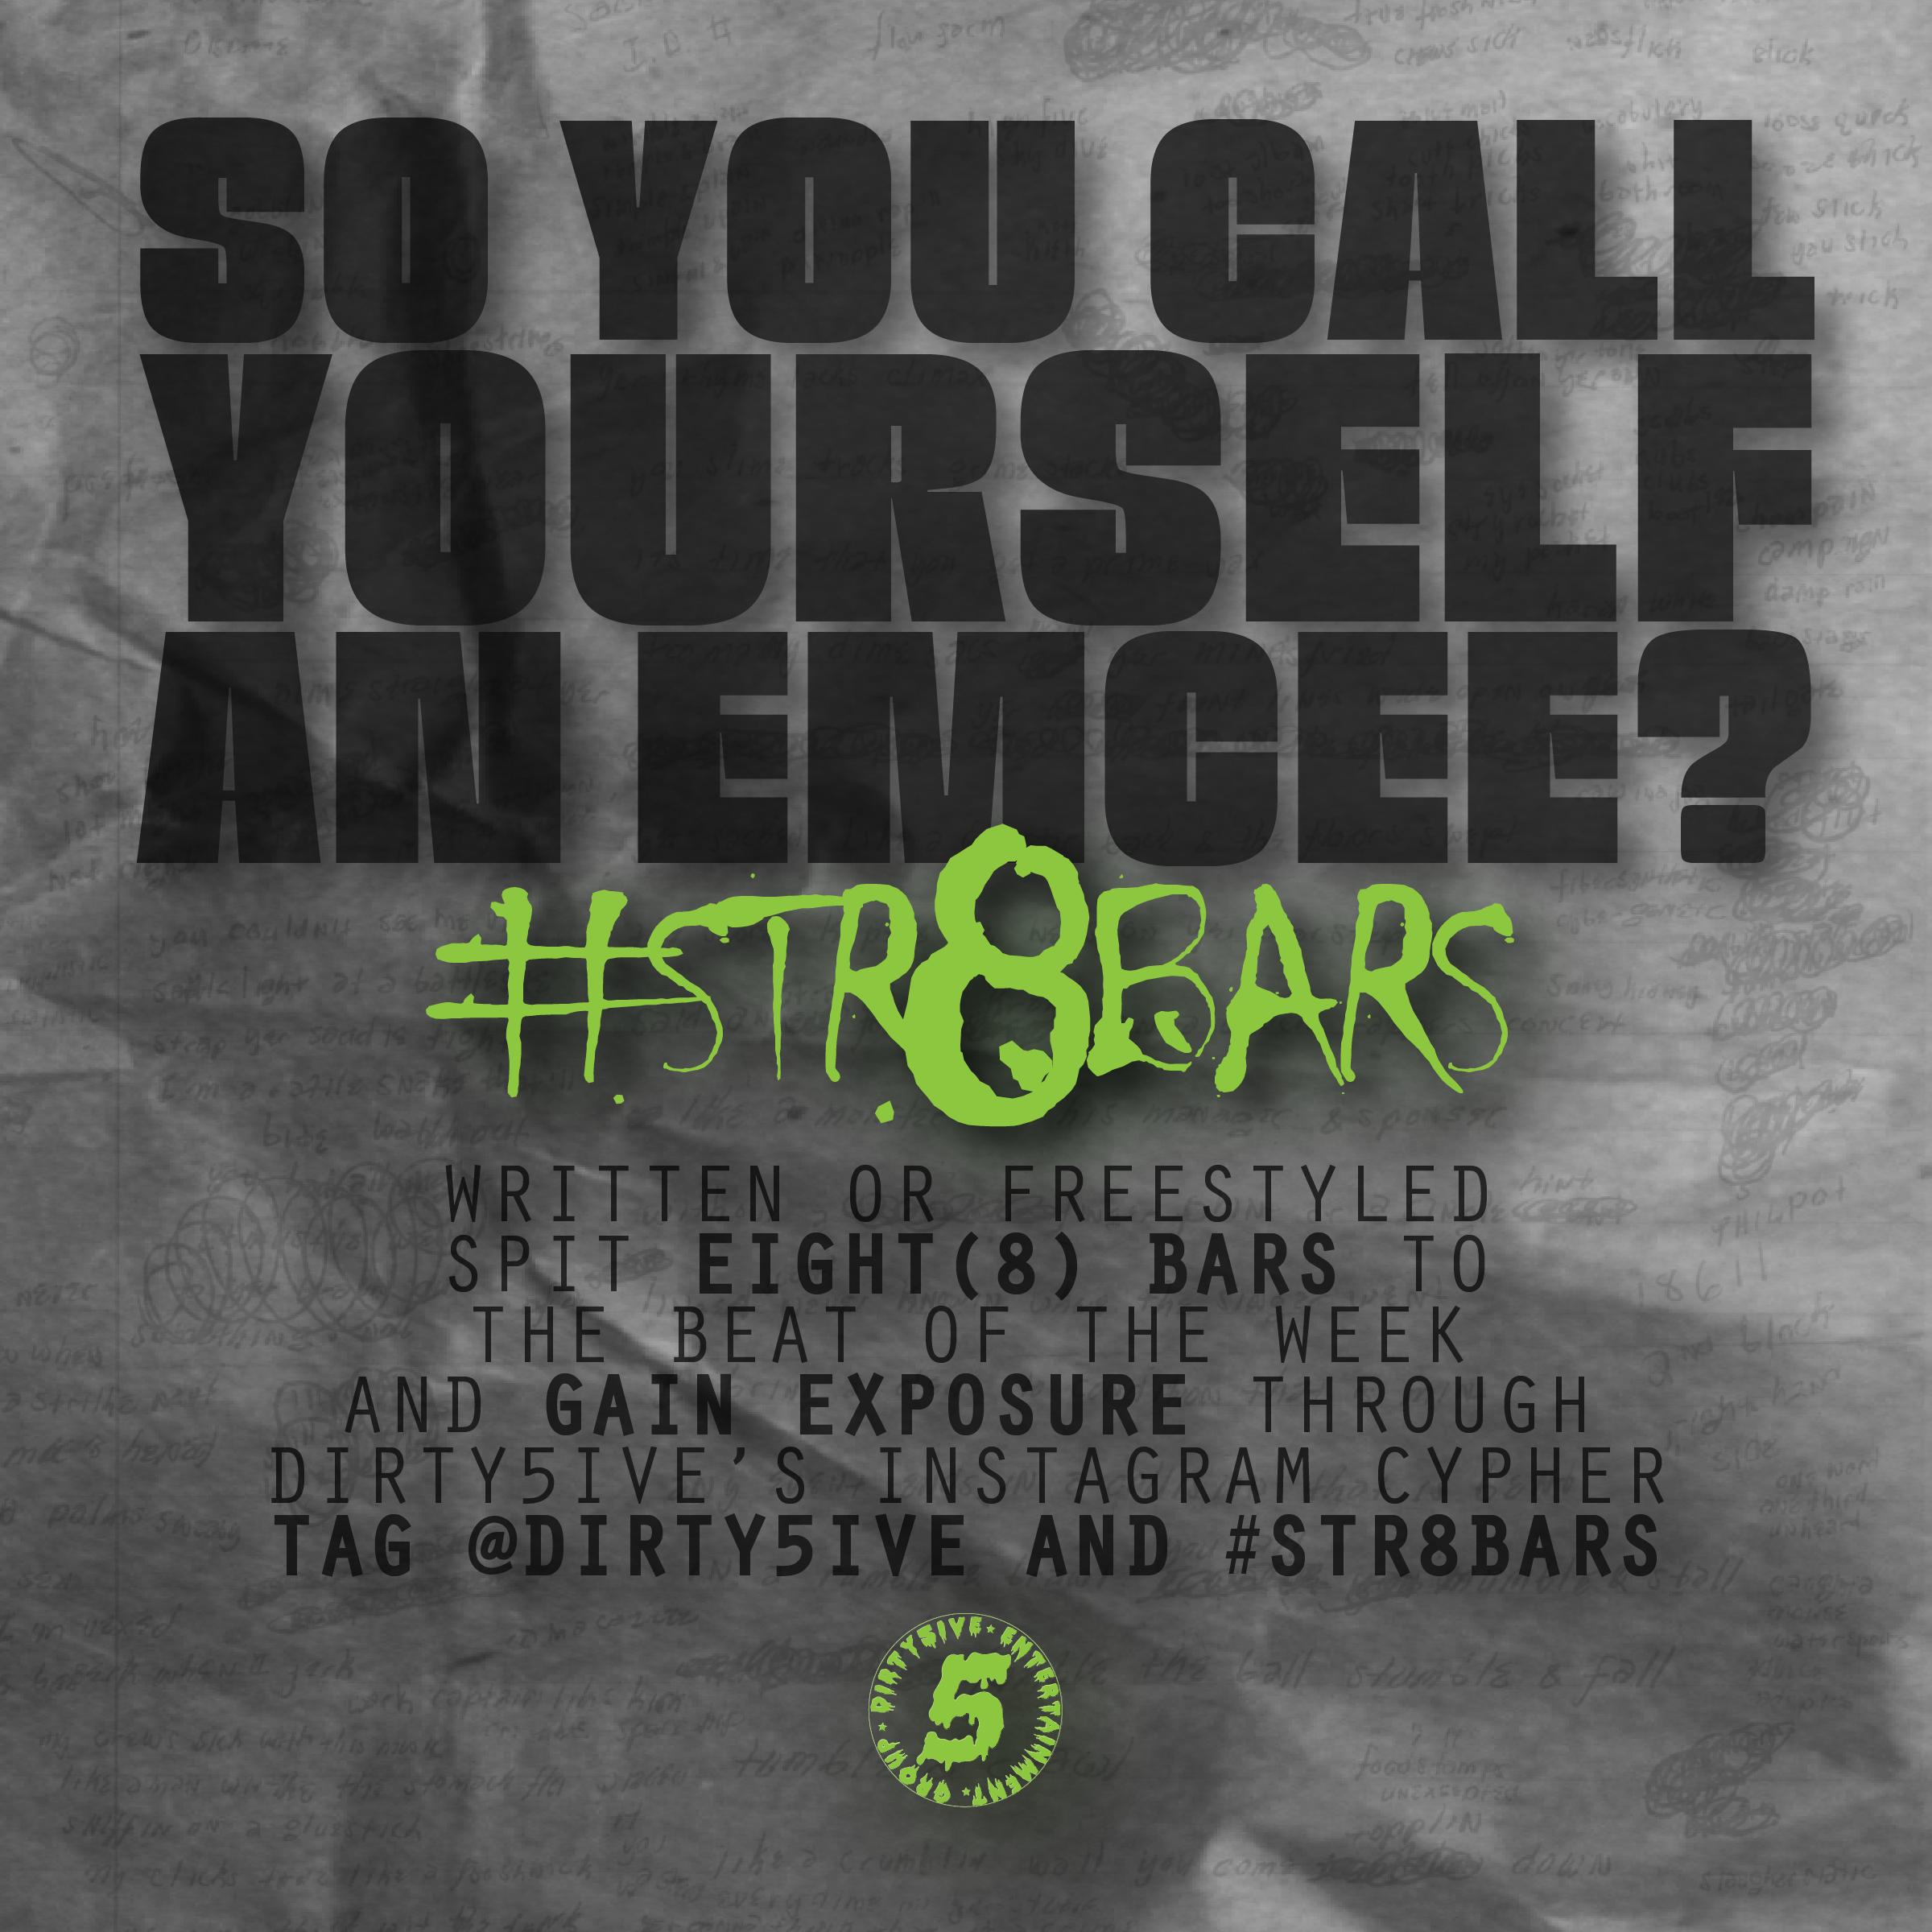 #STR8BARS